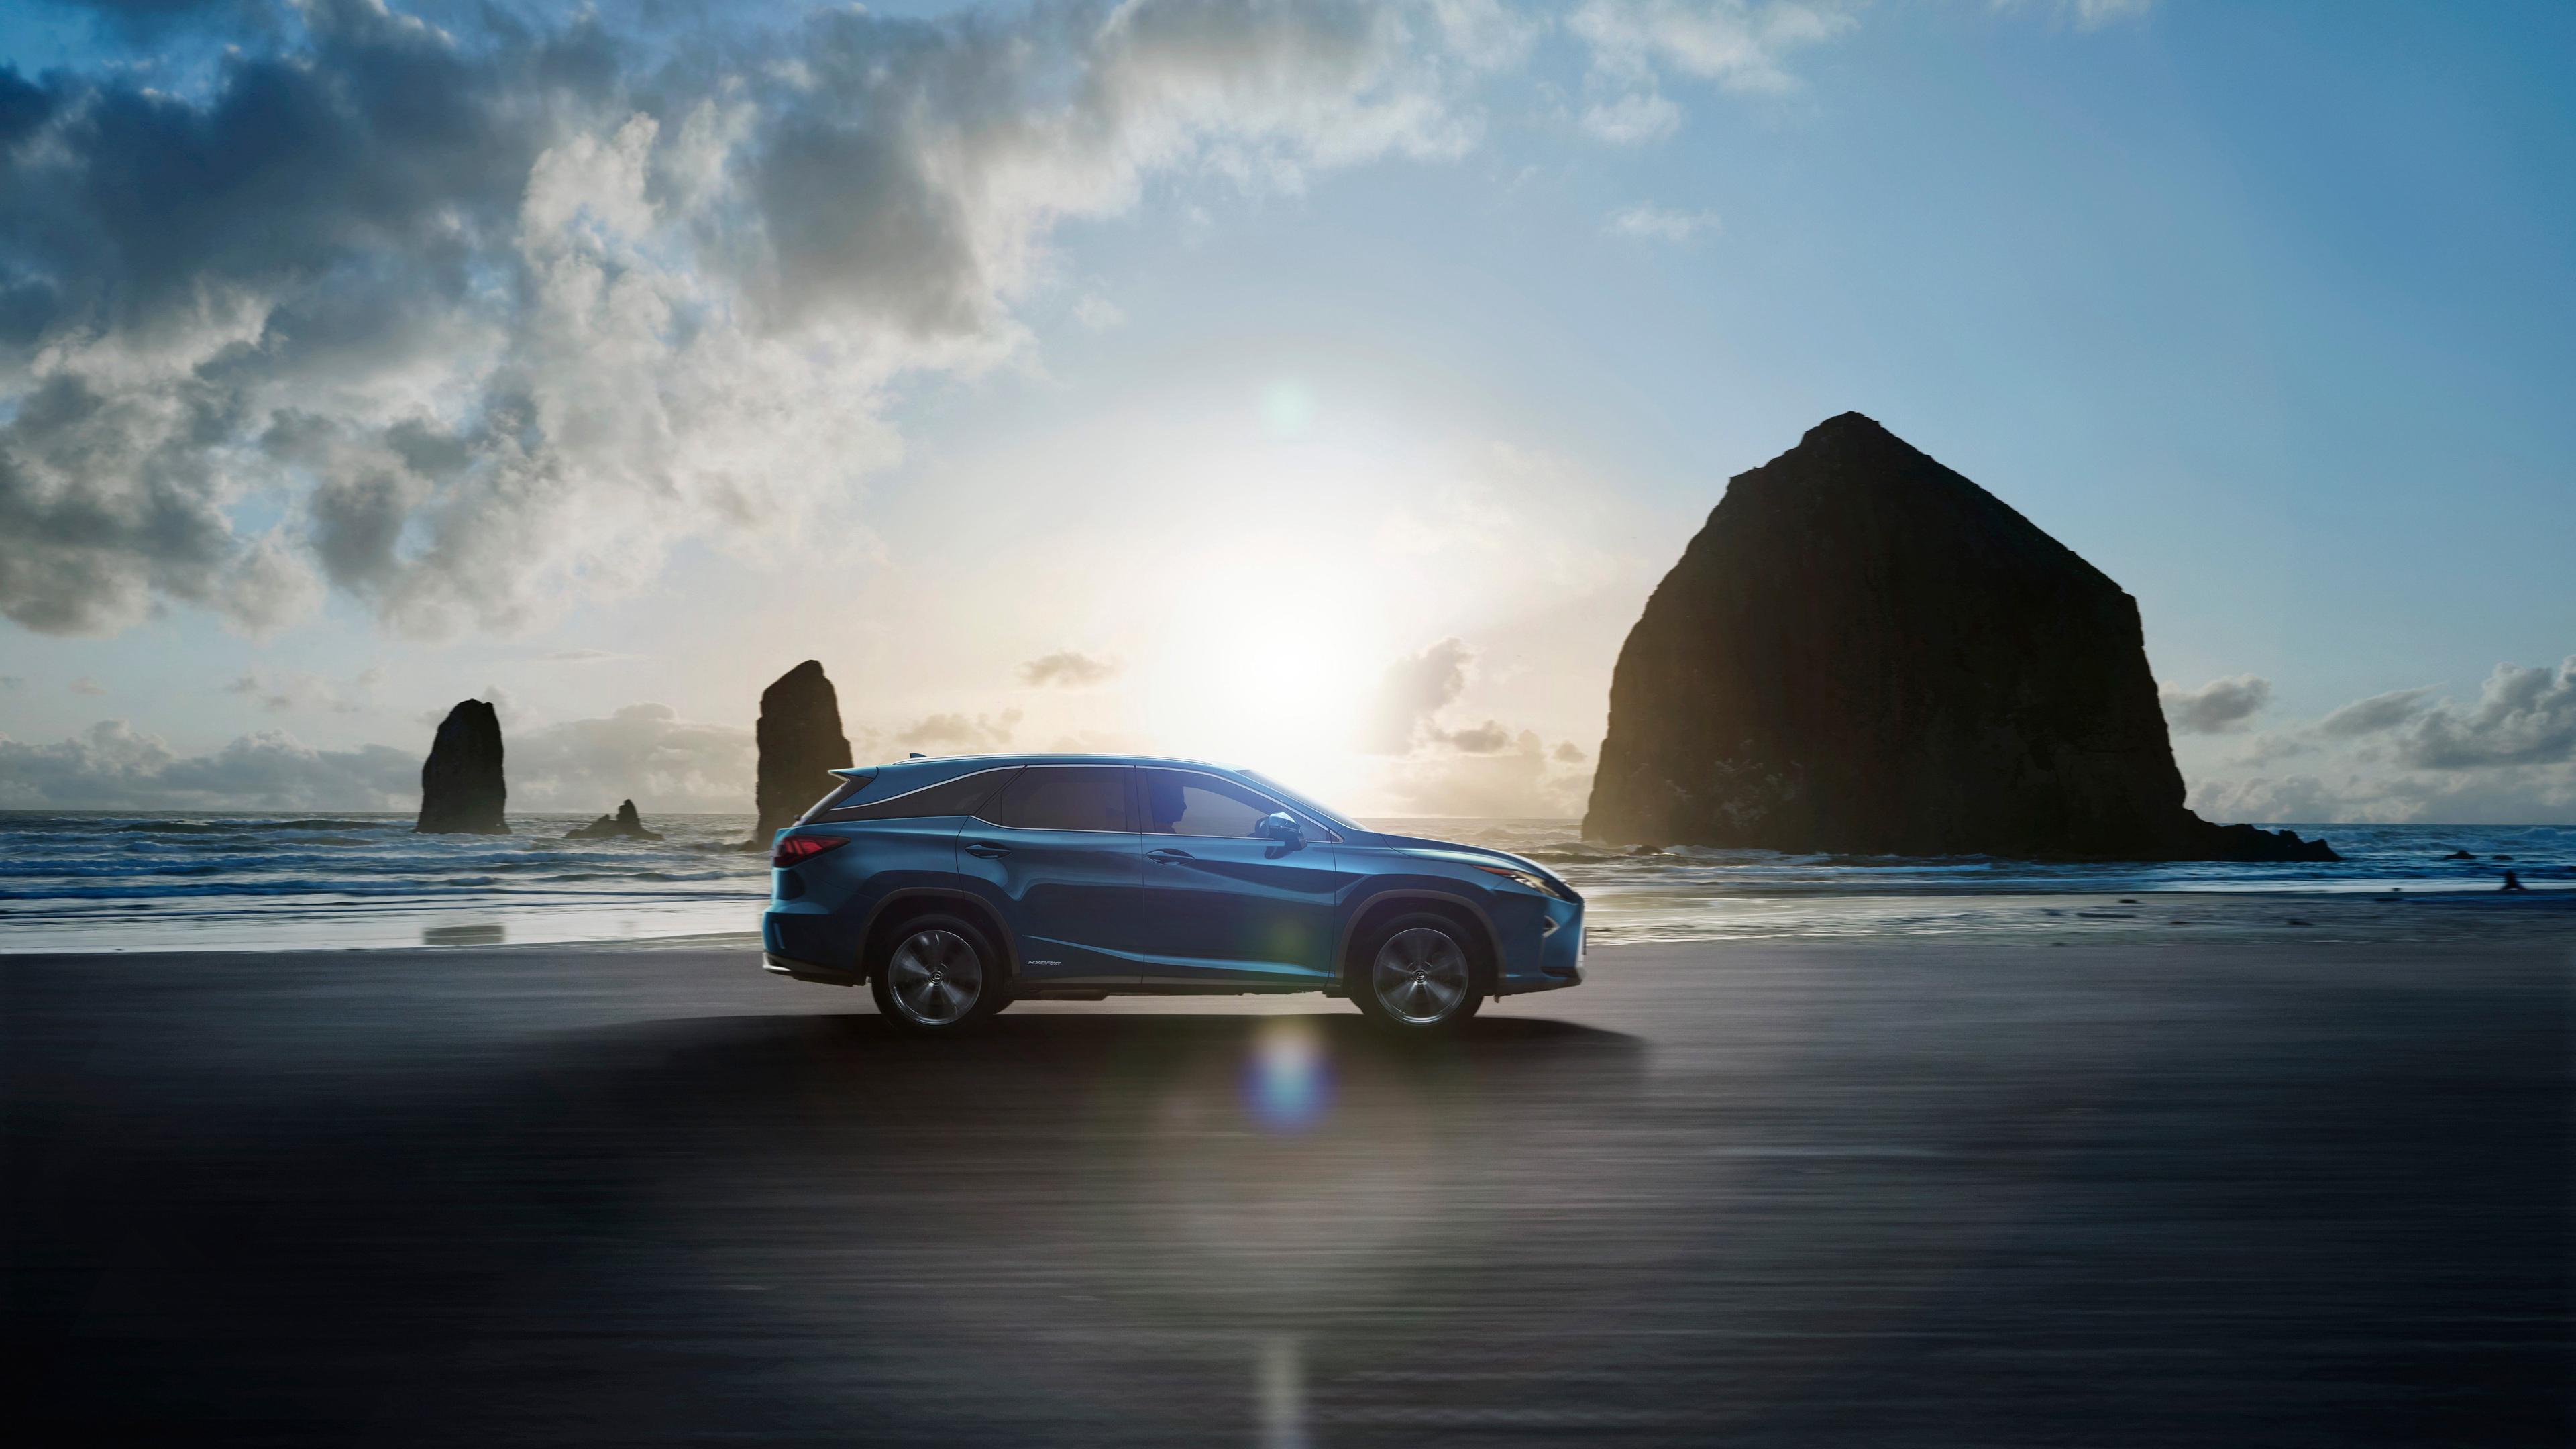 2018 lexus rx 450hl 1539108572 - 2018 Lexus RX 450hL - lexus wallpapers, lexus rx 450hl wallpapers, hd-wallpapers, cars wallpapers, 4k-wallpapers, 2018 cars wallpapers